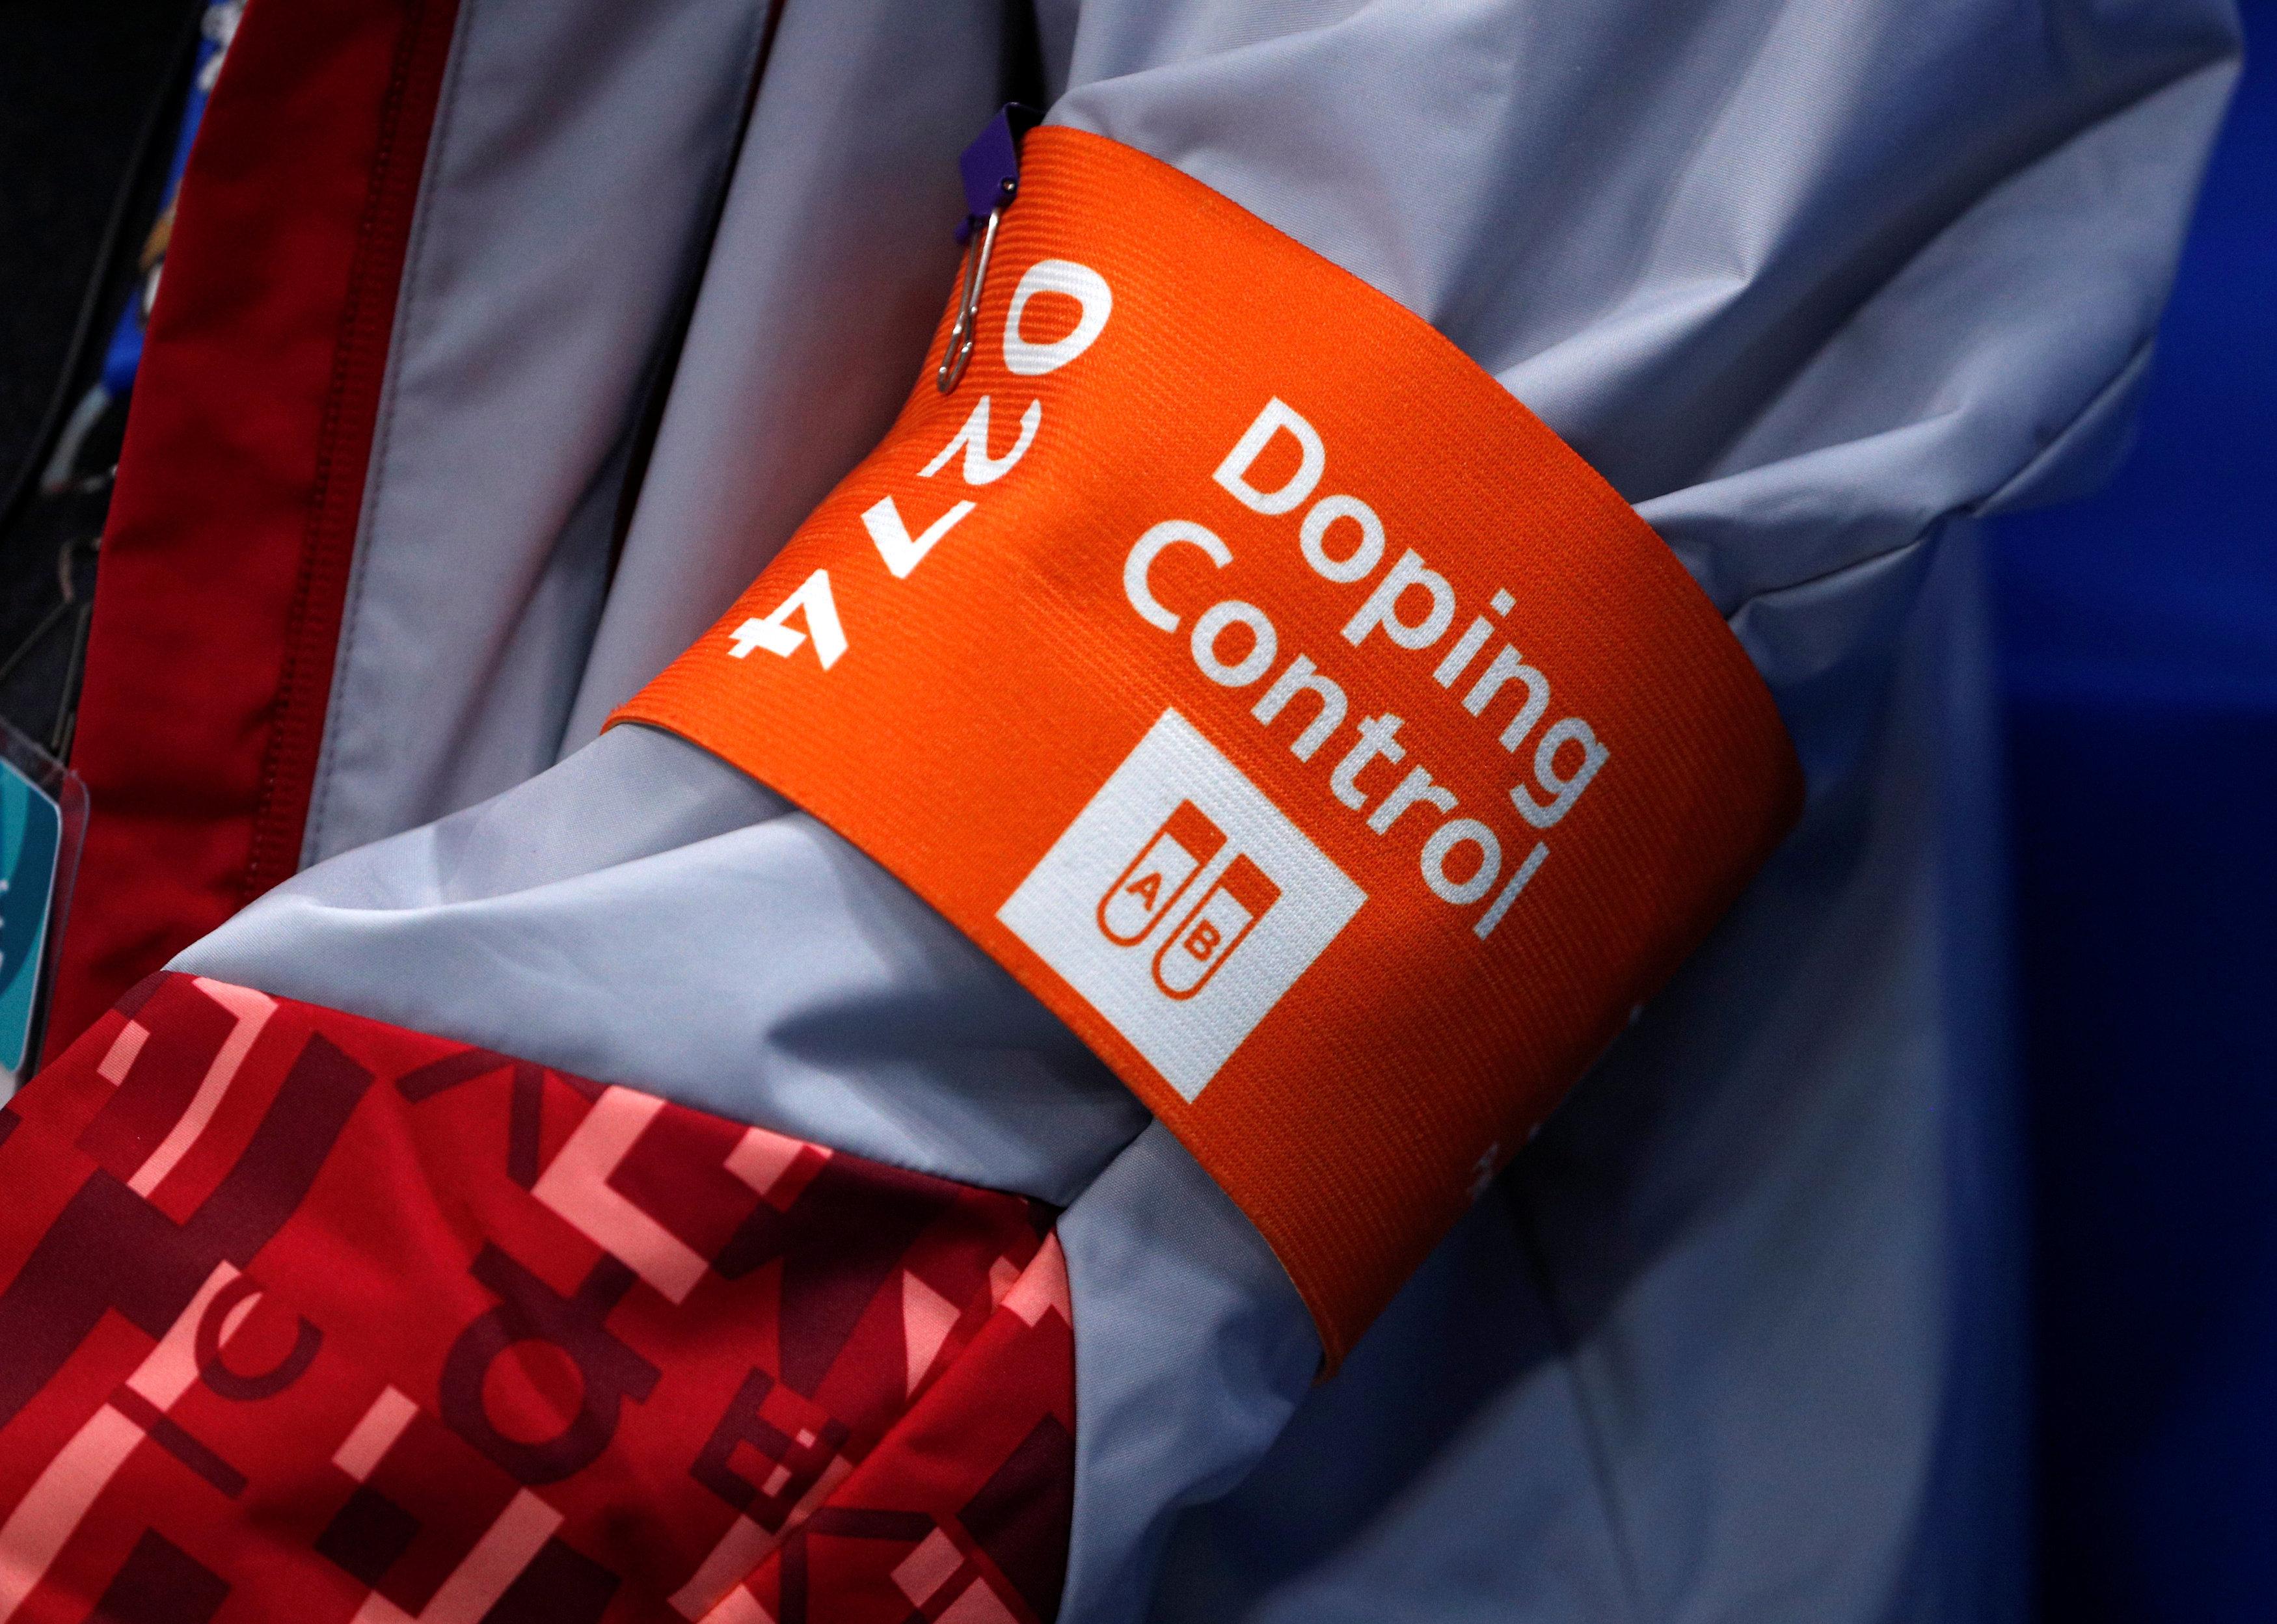 Владимир Путин подписал закон о штрафах за допинг для спортсменов